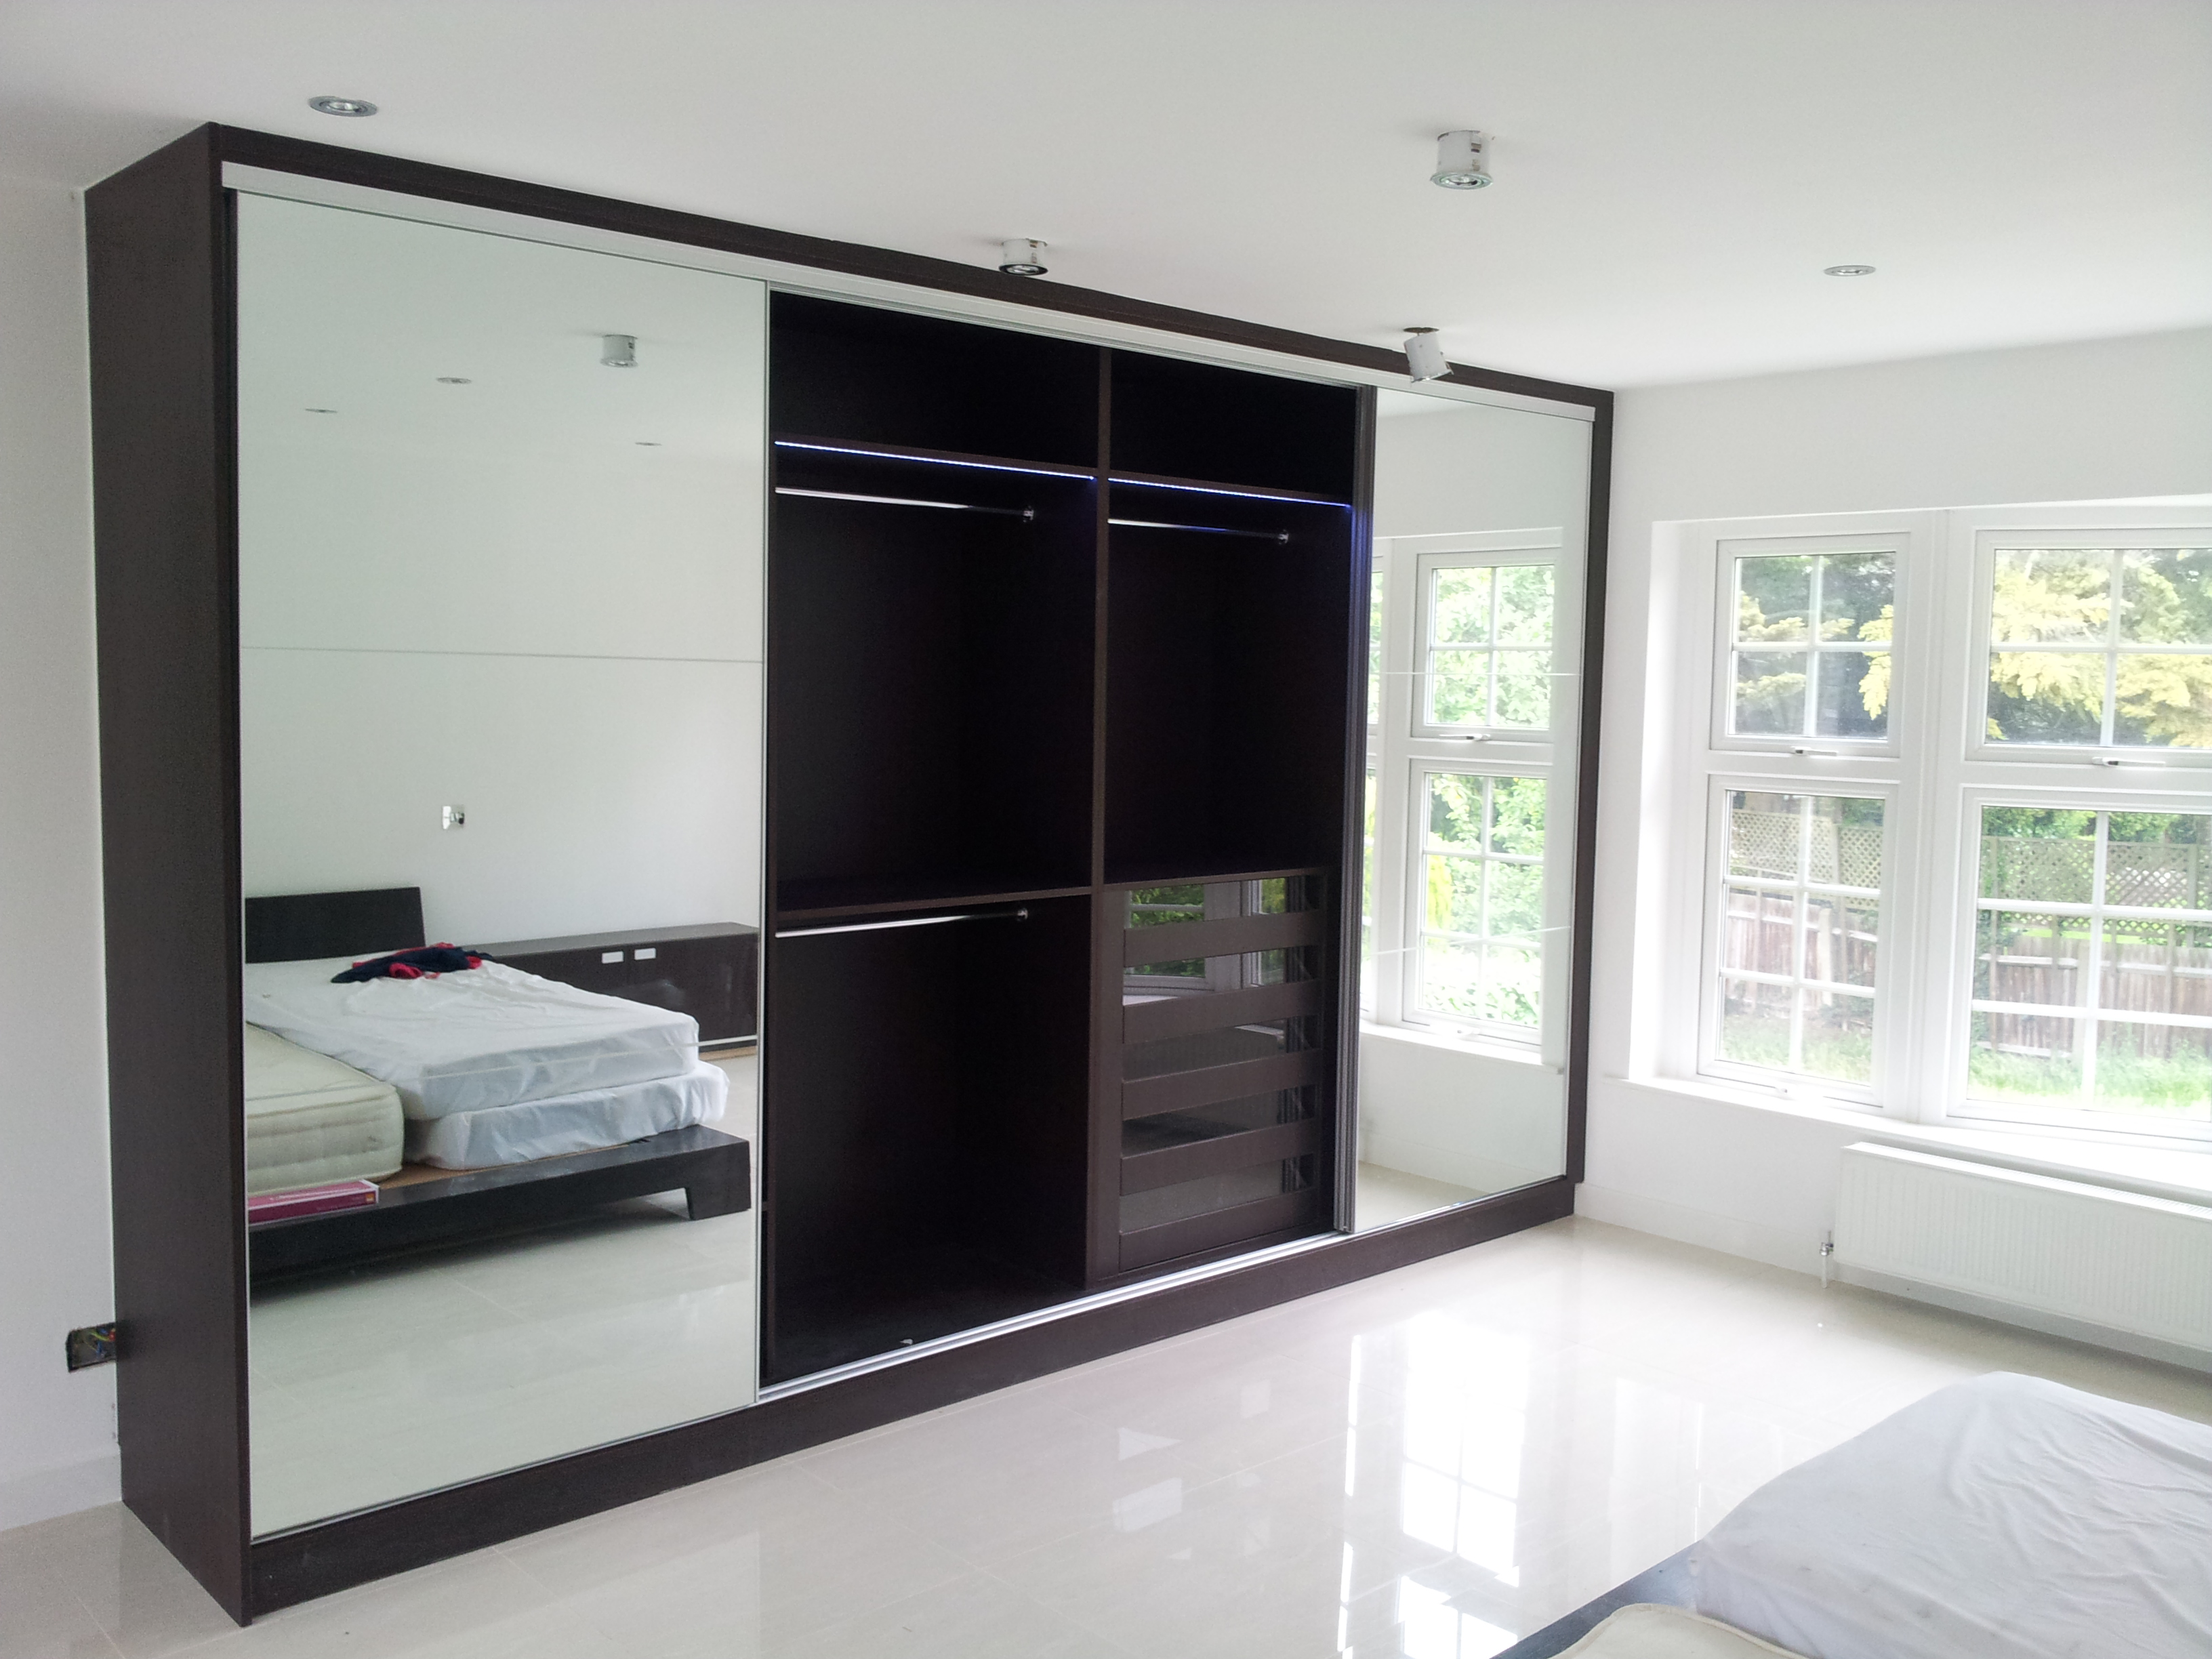 on interior wardrobe door images sliding lookmyhomeideas pinterest interiors pulls bedroom best doors and knobs design